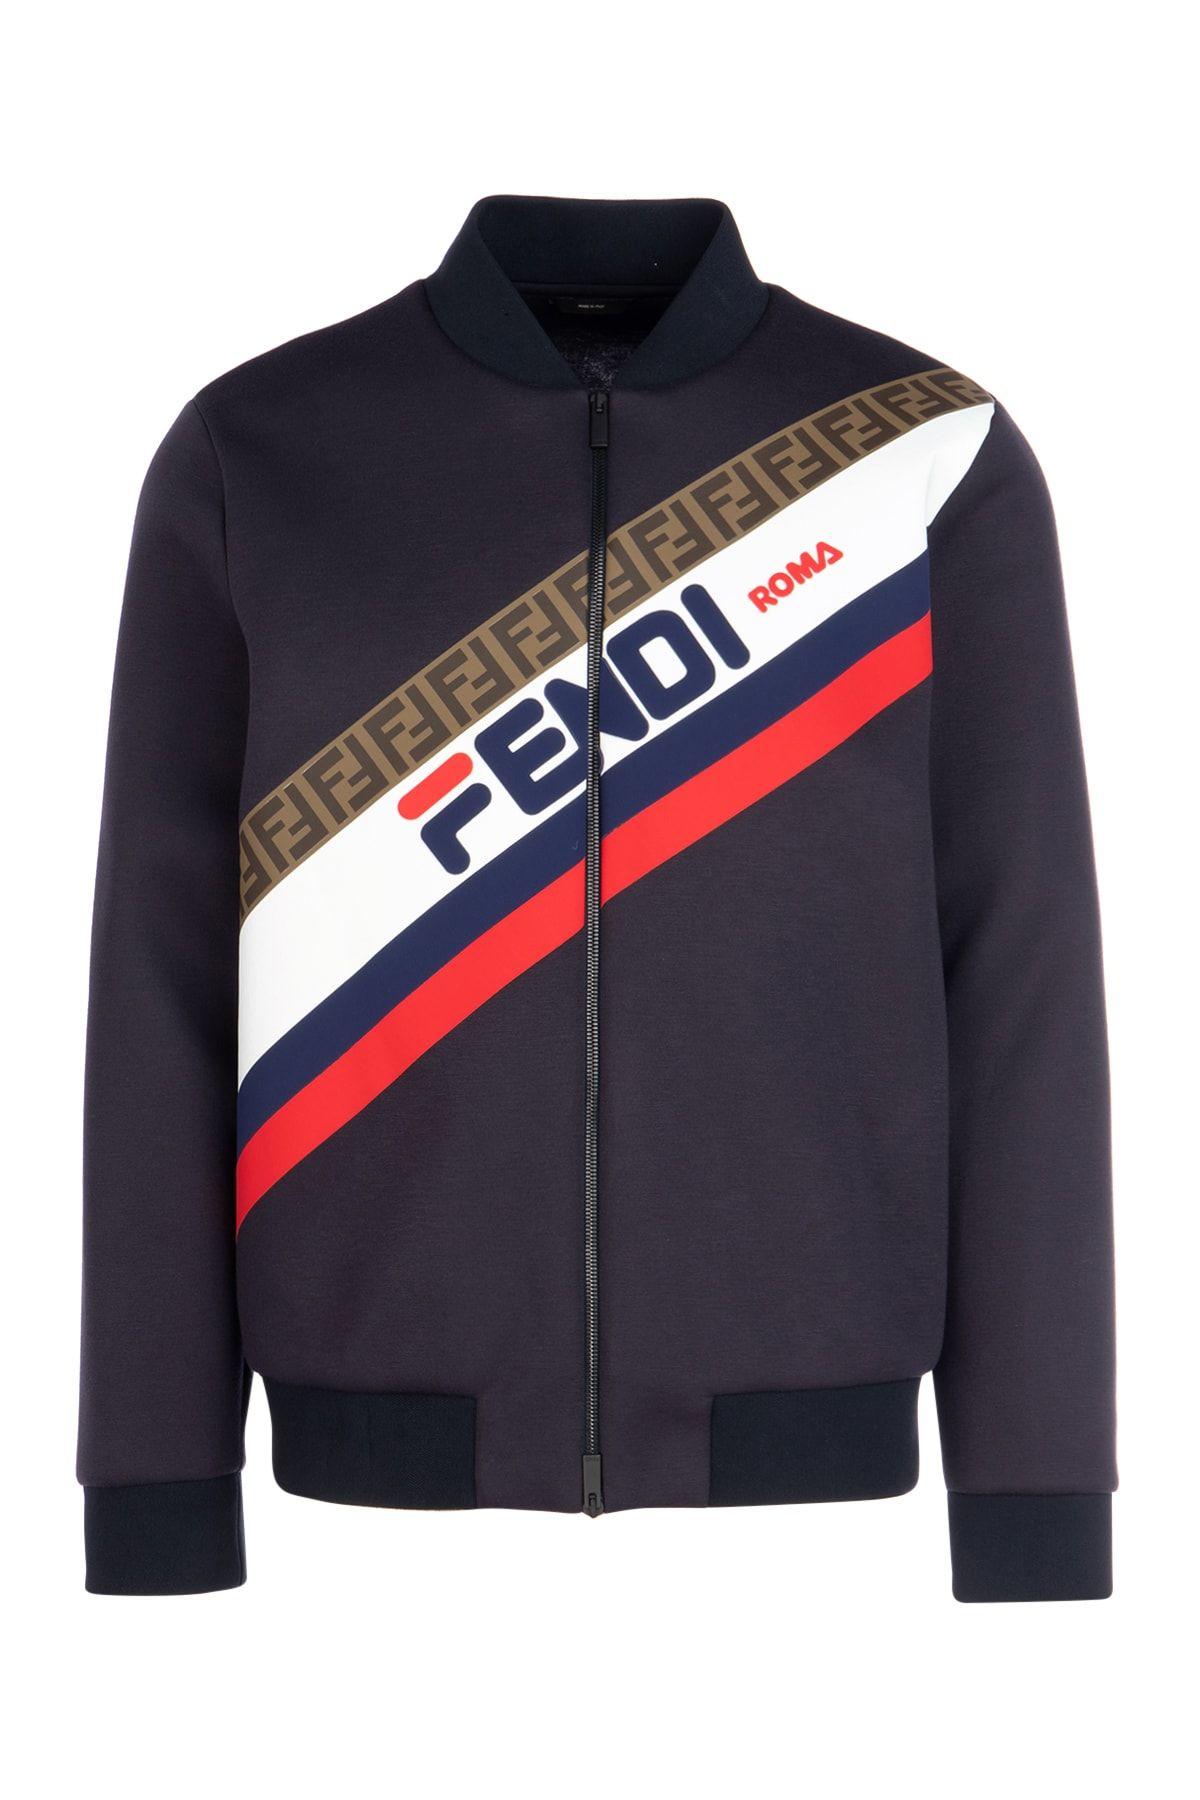 fecce93f1 FENDI FENDI x FILA 限量合作MANIA系列夹克.  fendi  cloth